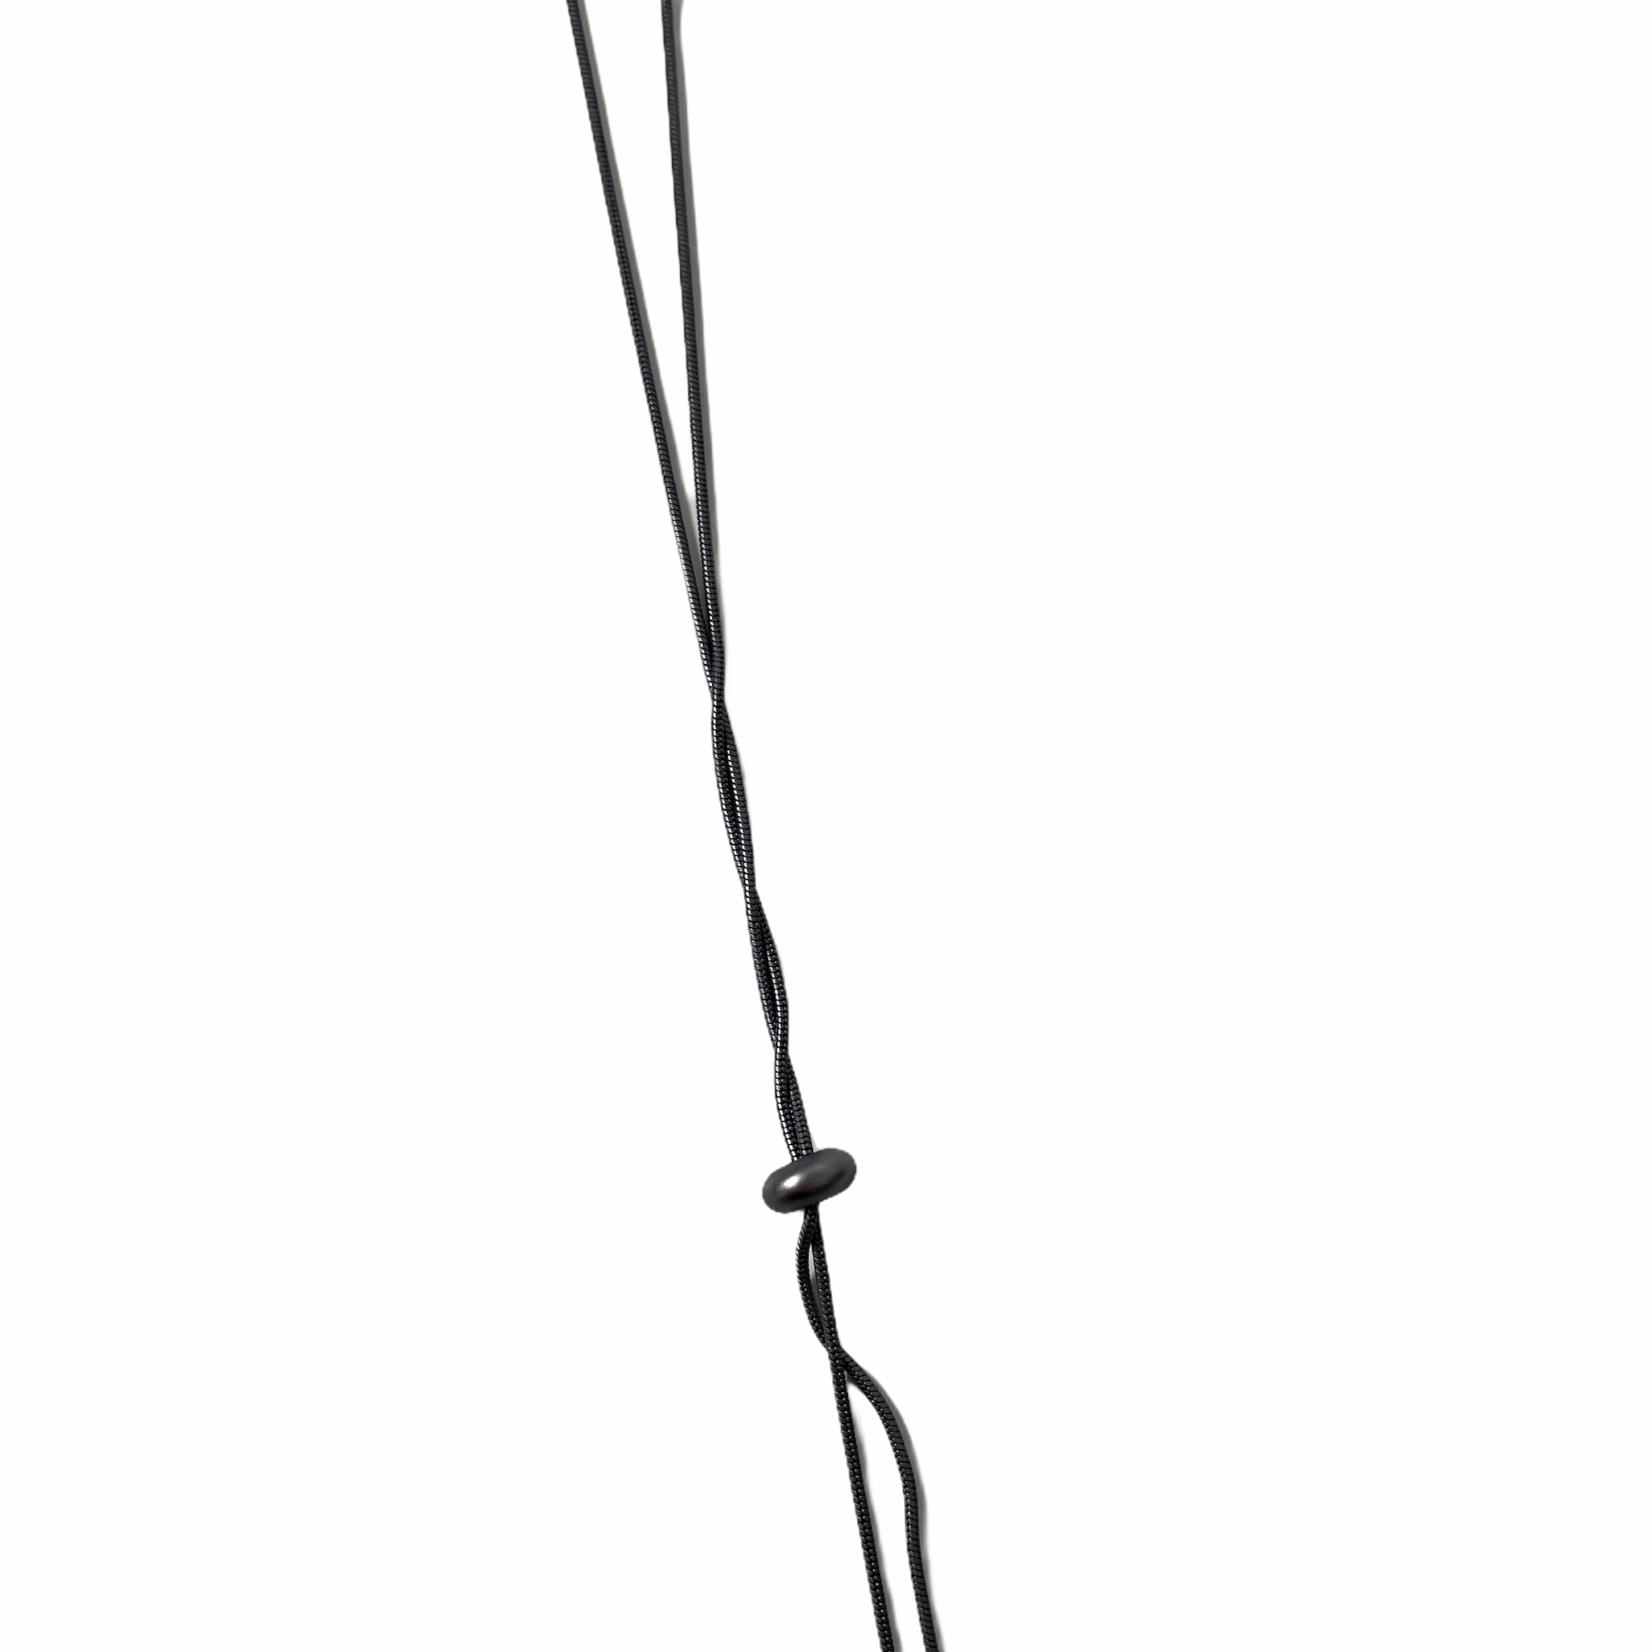 Biba Ketting lang in gun metal met ruitvormige hanger